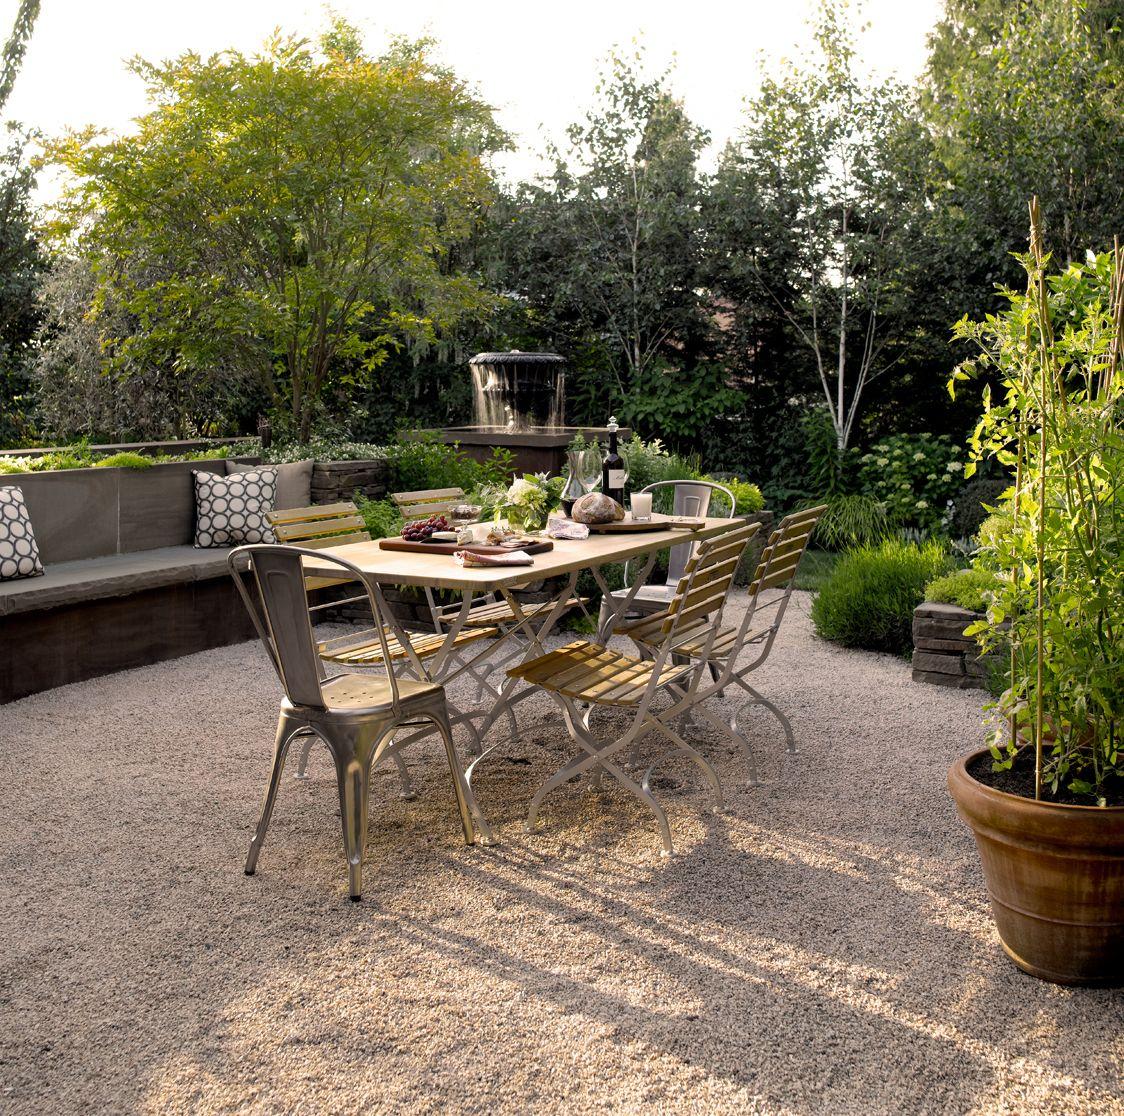 Backyard Patio Diy: French Style Gravel Patio